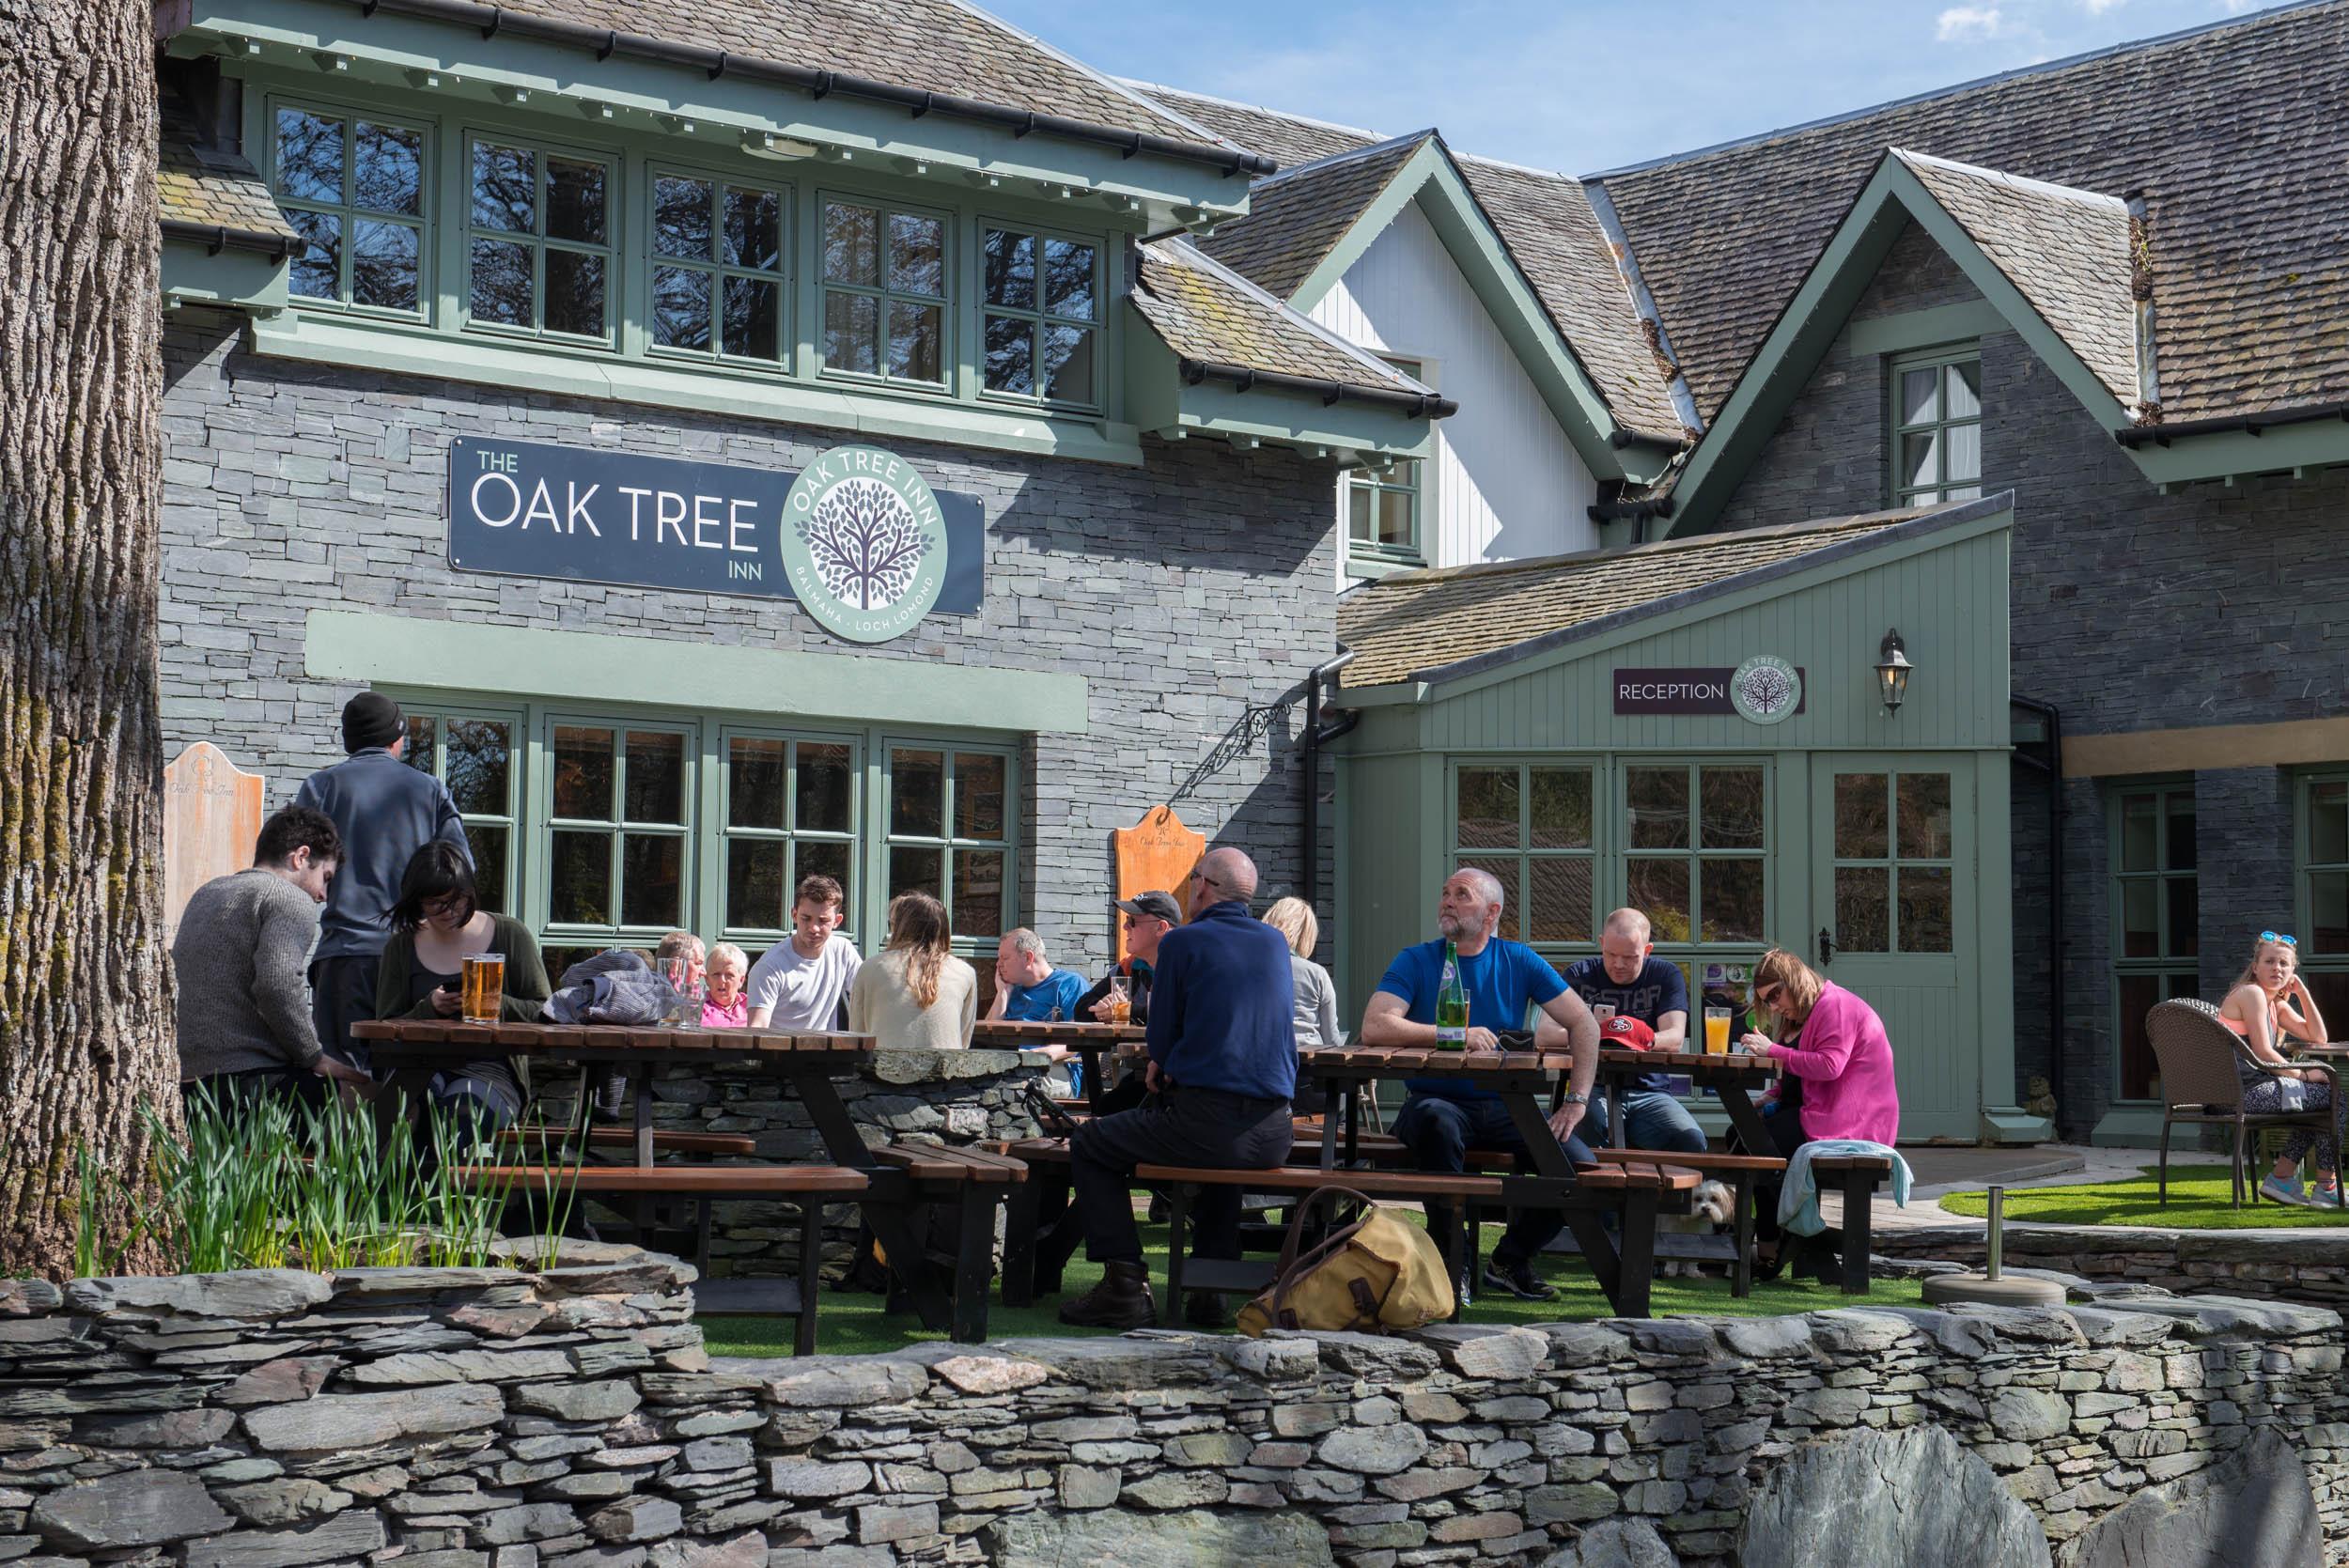 Oak-Tree-Inn-2.jpg